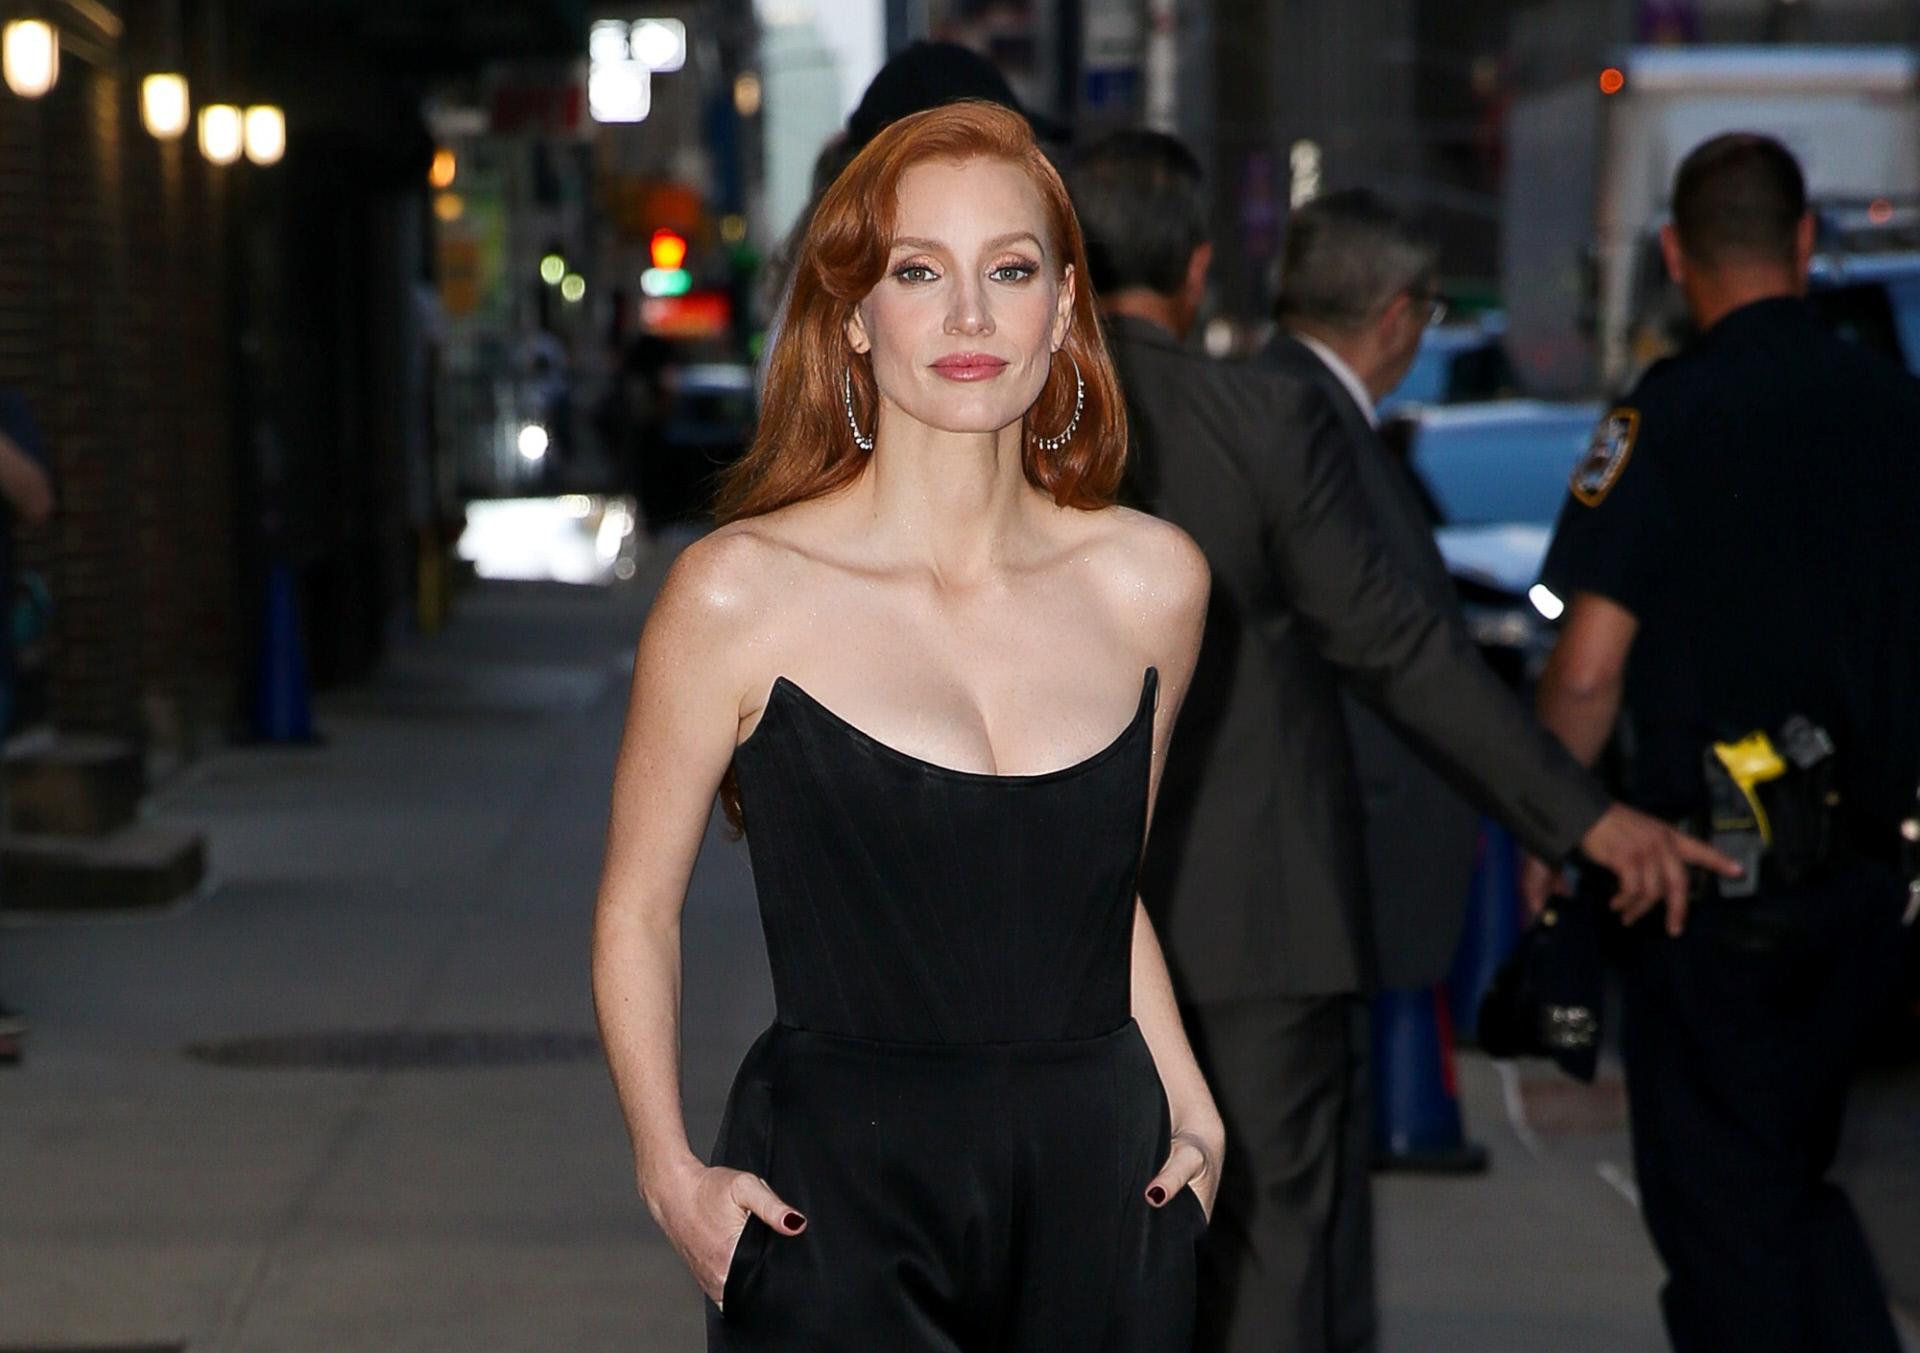 La sofisticación del negro da todo el protagonismo a la Jessica Chastain.